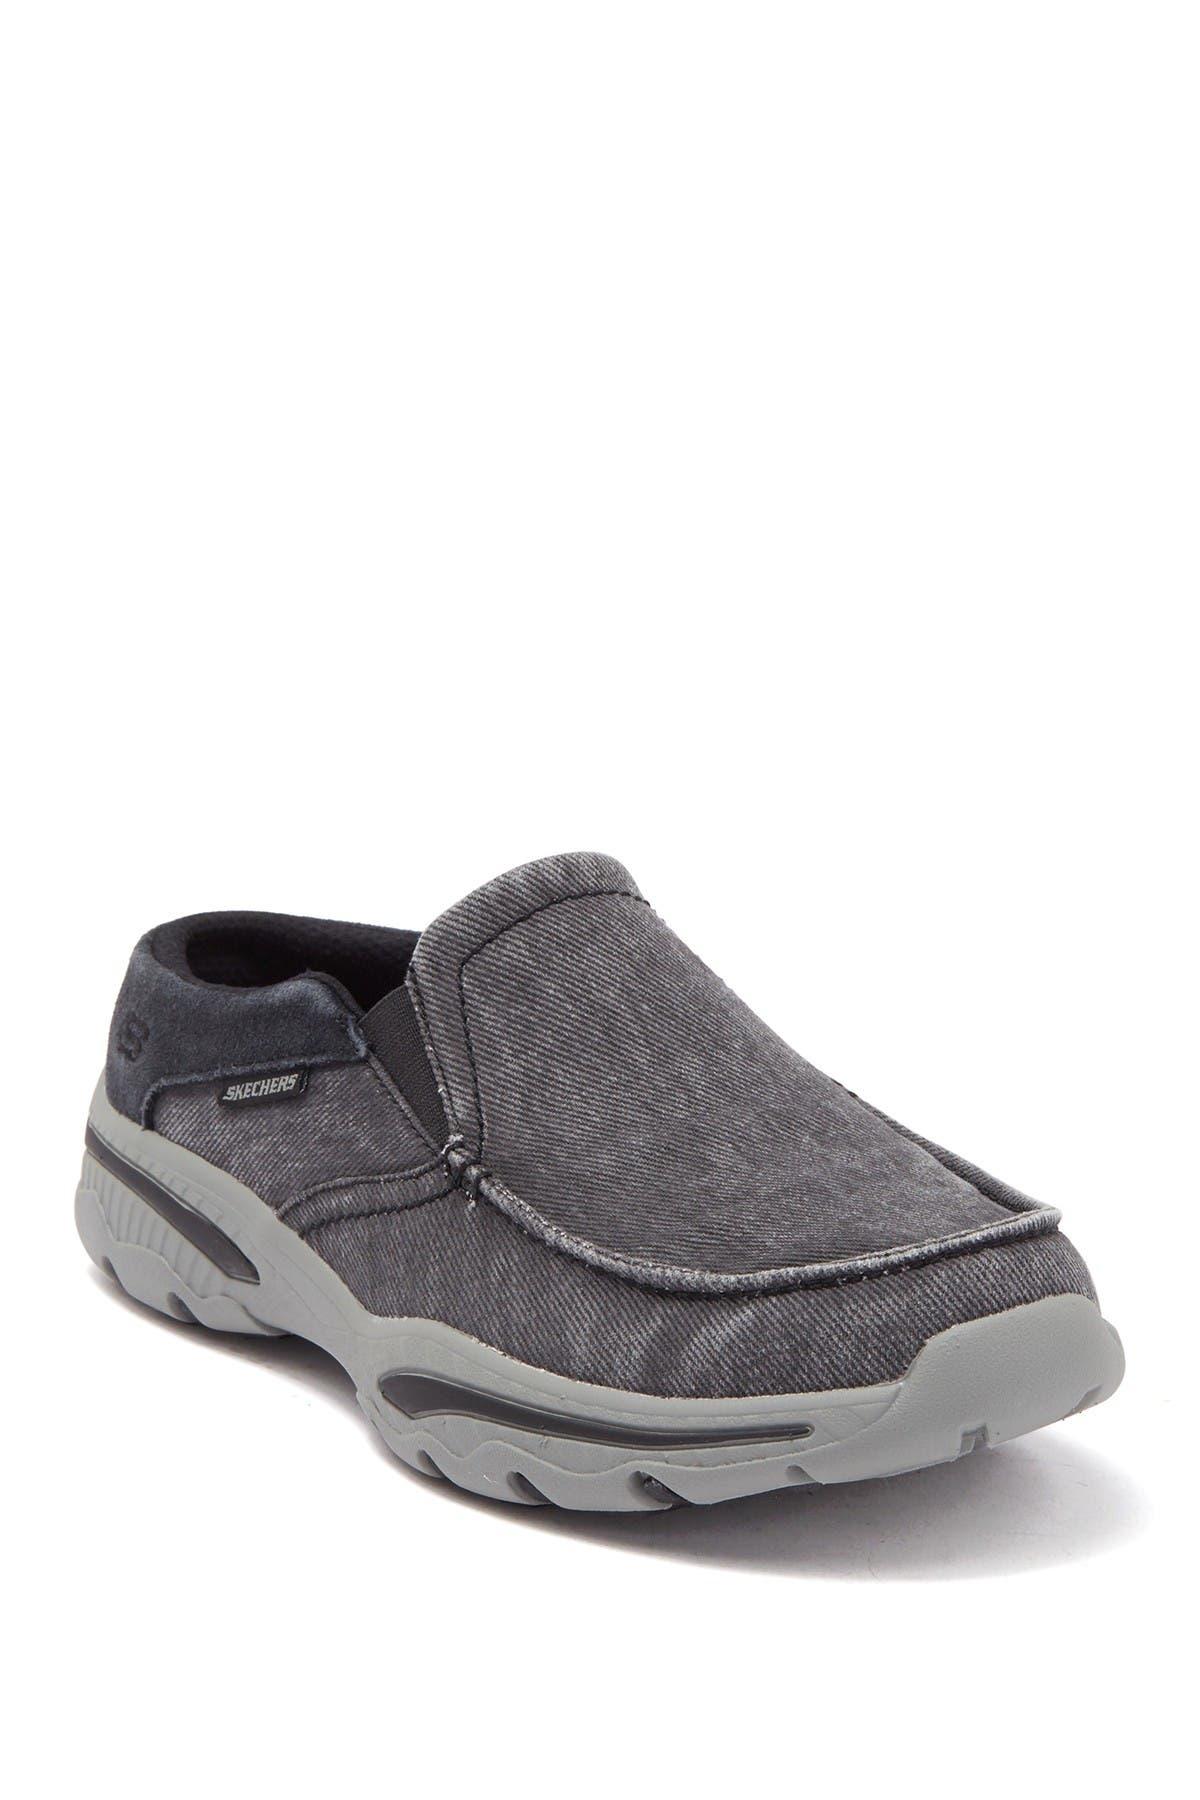 Image of Skechers Creston Backlot Slip-On Shoe